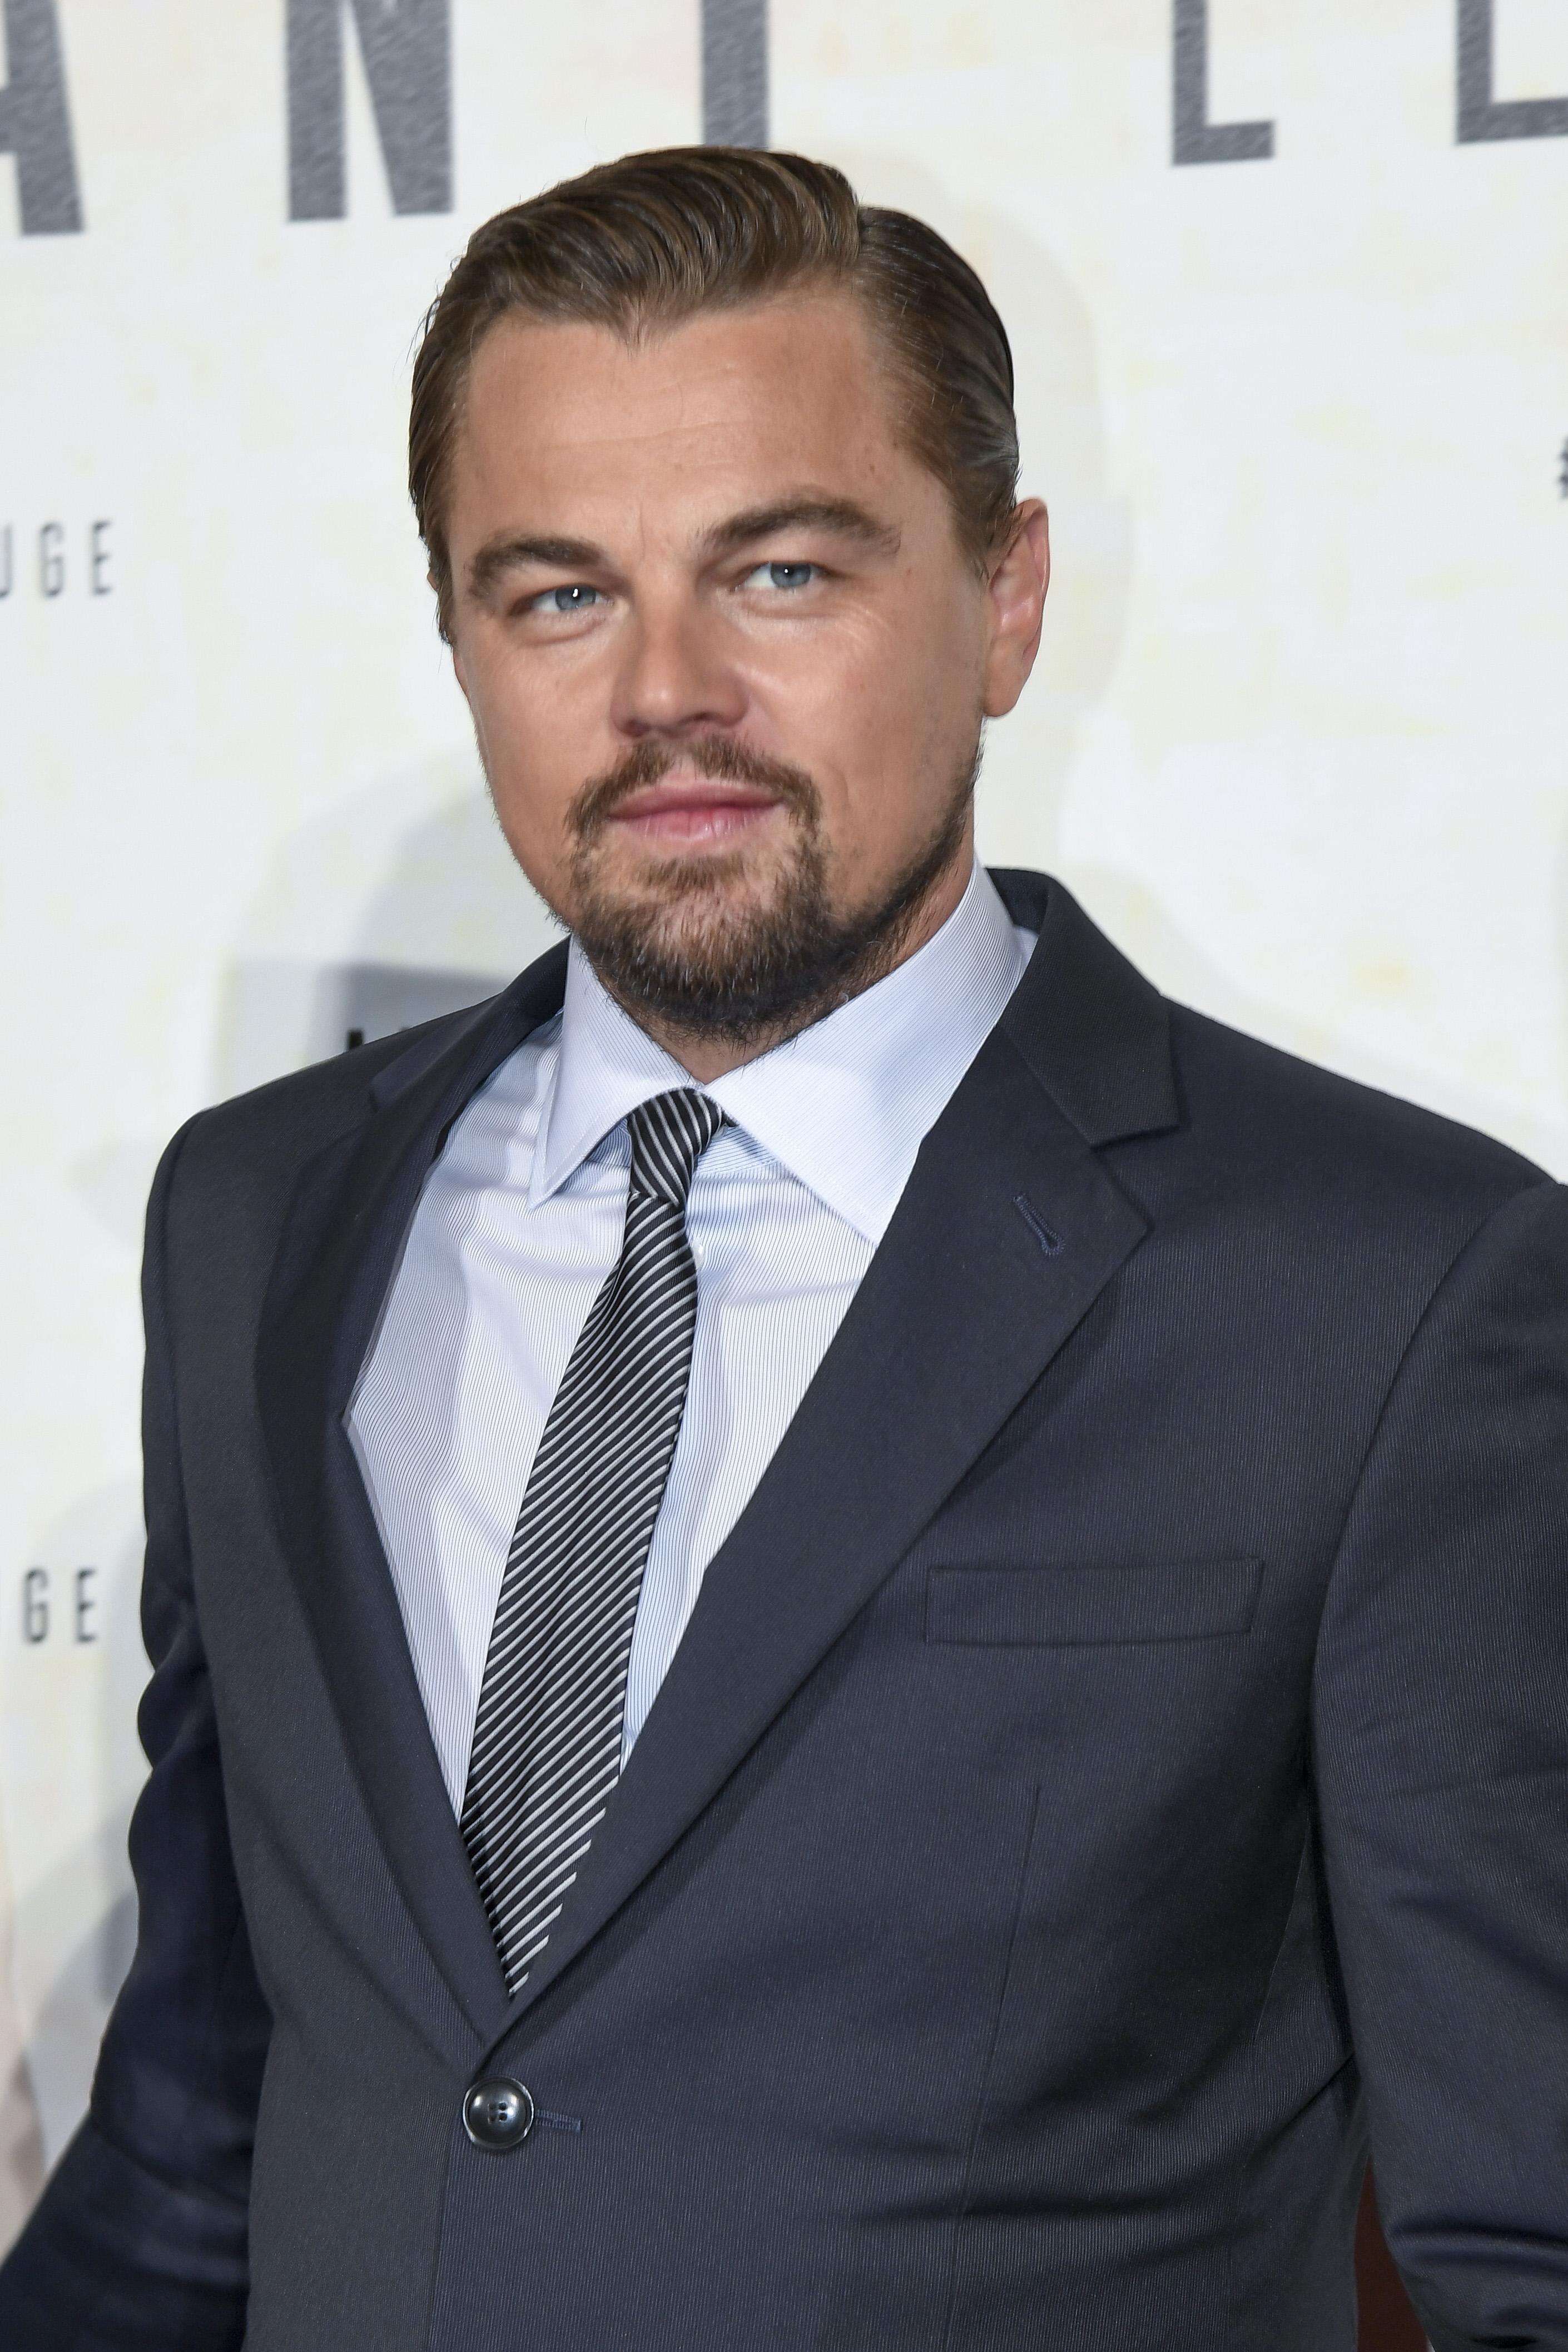 Leonardo Di Caprio attends the 'Before the Flodd -  Premiere at Theatre du Chatelet on October 17, 2016 in Paris, France.  <P> Pictured: Leonardo Di Caprio <B>Ref: SPL1375887  181016  </B><BR/> Picture by: KCS Presse / Splash News<BR/> </P><P> <B>Splash News and Pictures</B><BR/> Los Angeles:310-821-2666<BR/> New York:212-619-2666<BR/> London:870-934-2666<BR/> <span id=